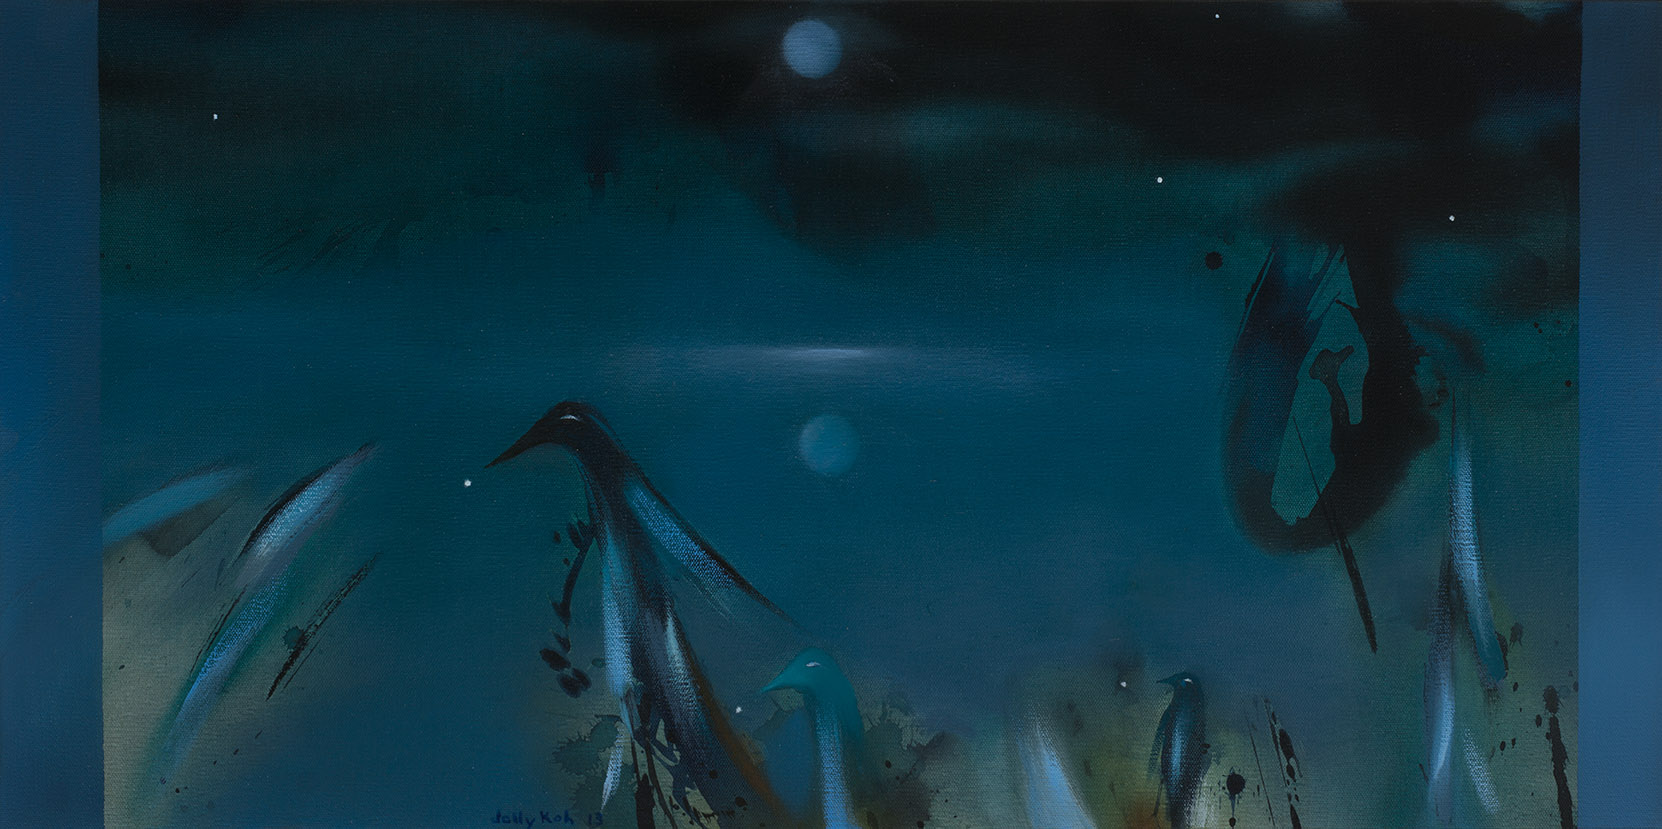 Moon Reflection & Bird